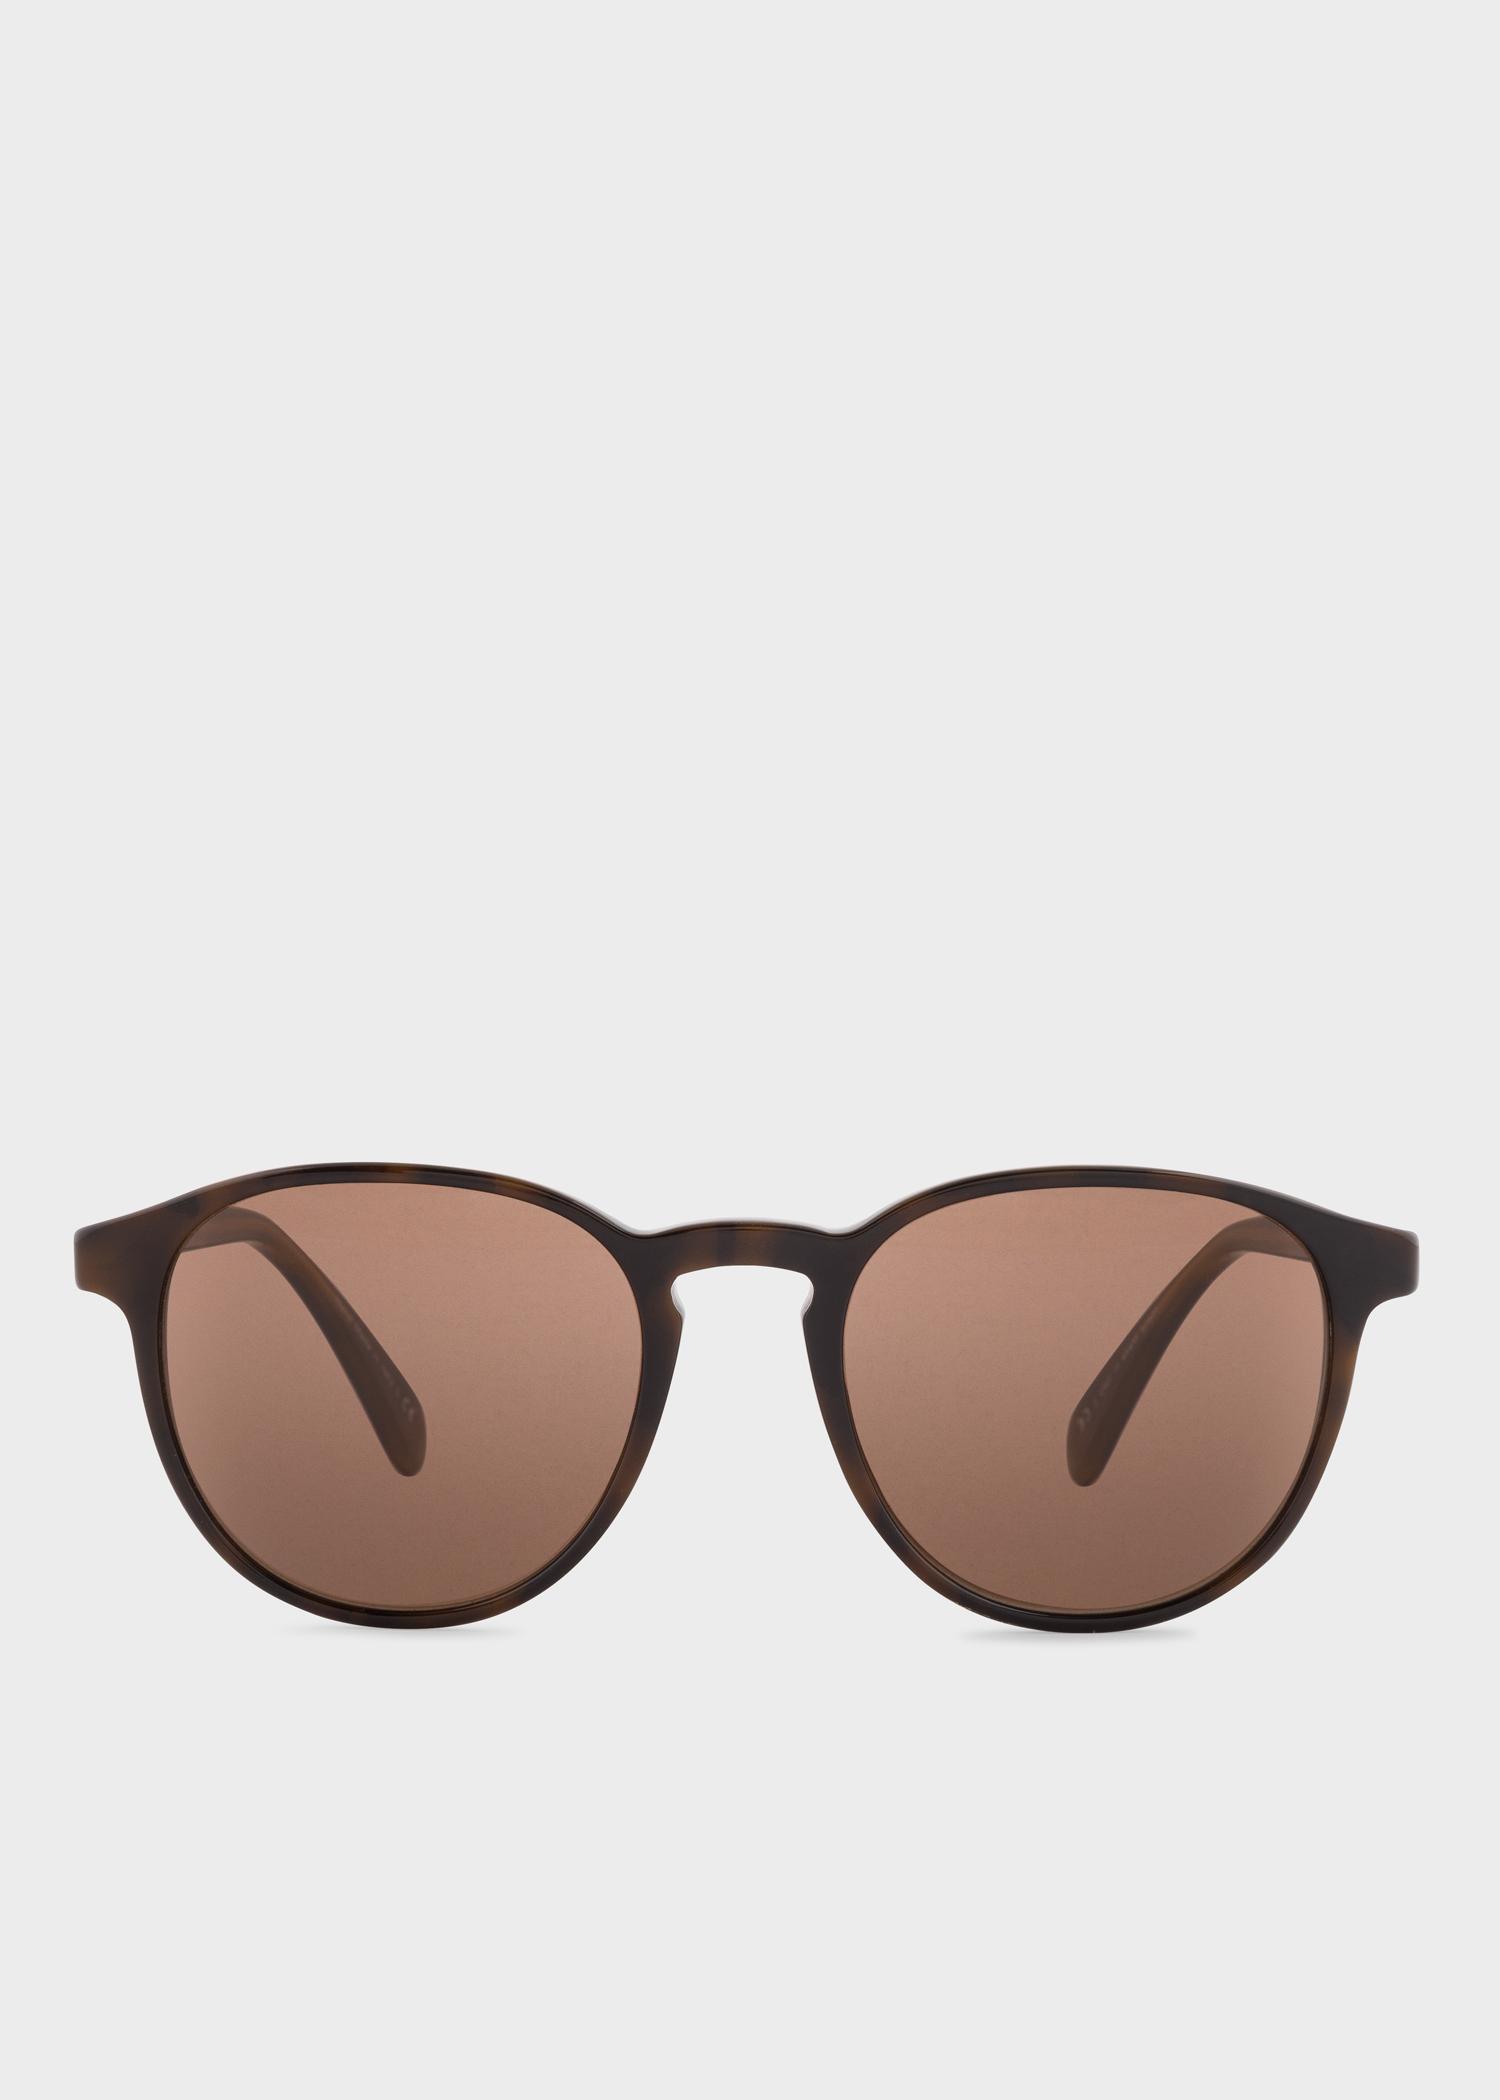 91c002805 Brown 'Mayall' Sunglasses - Paul Smith Europe